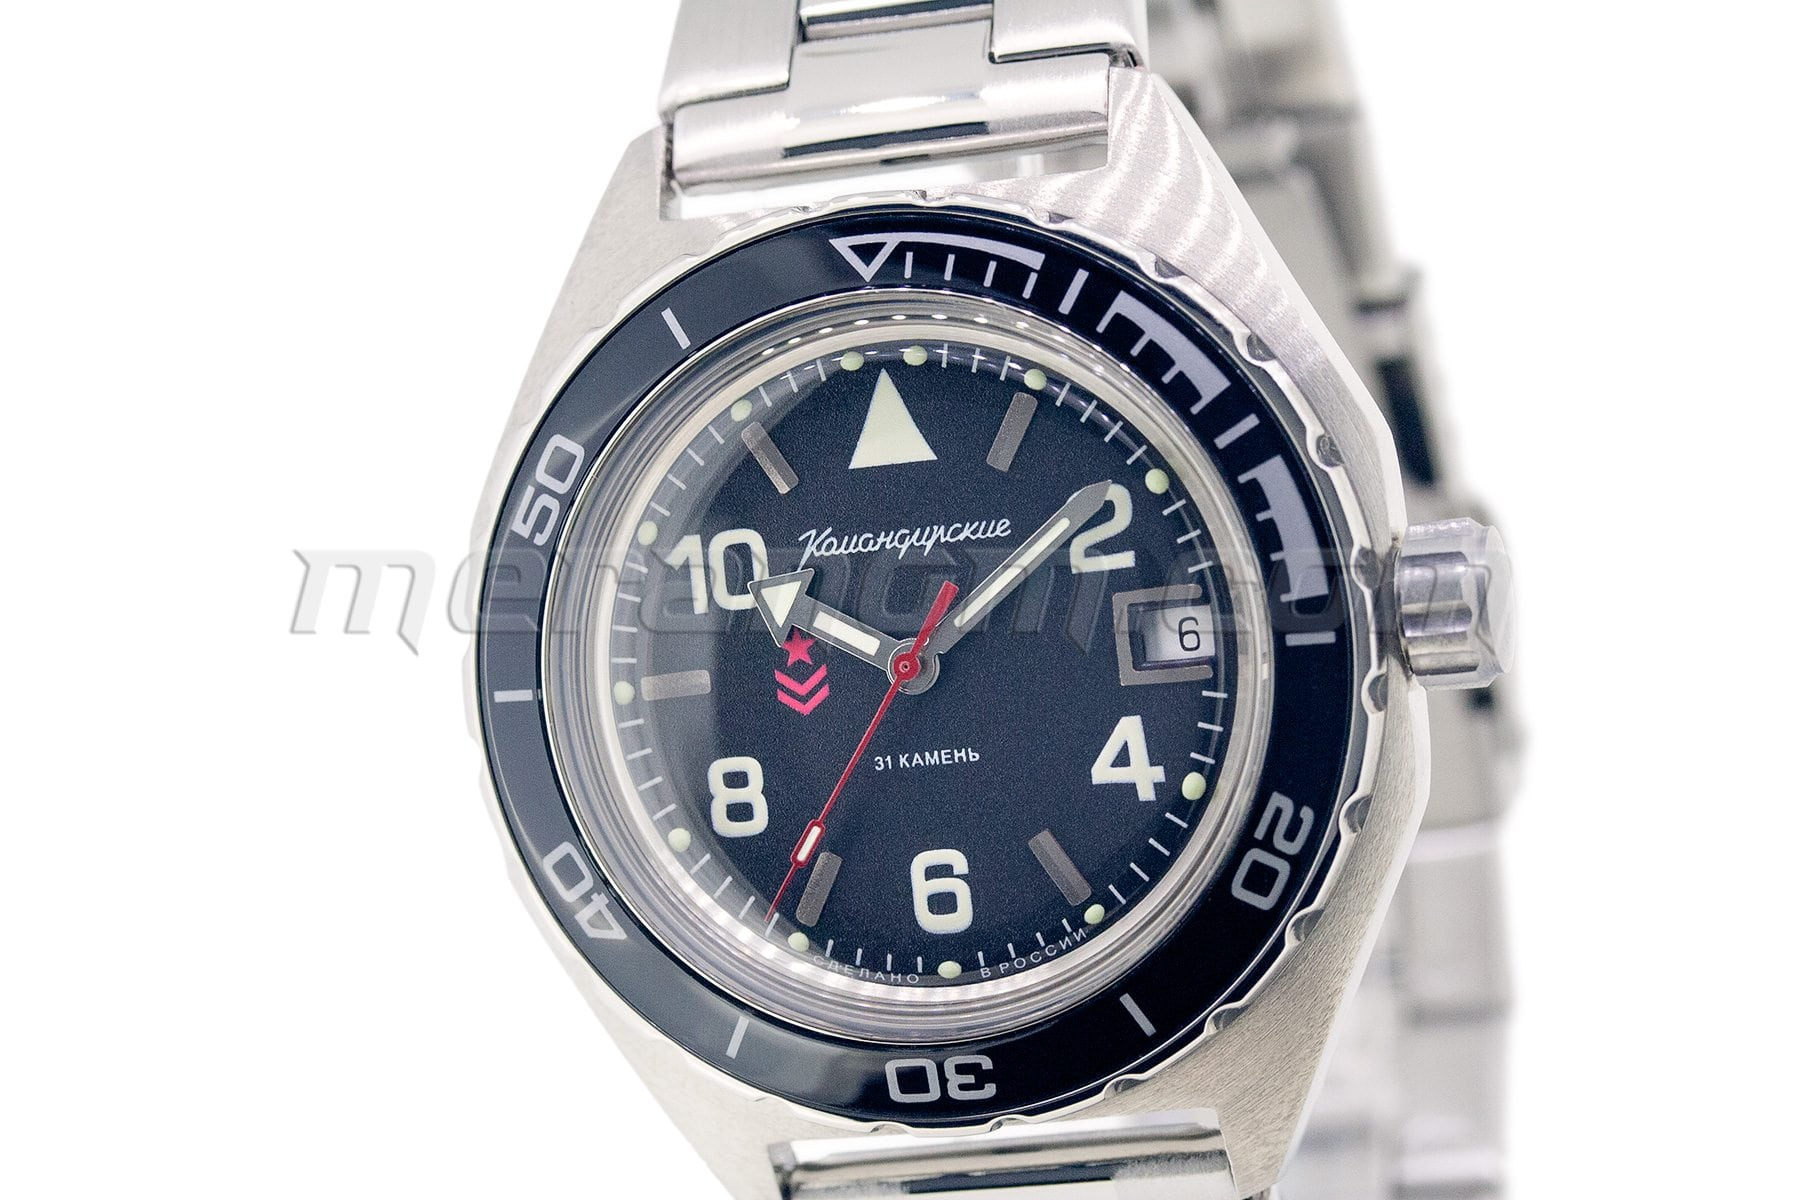 Vostok watch komandirskie 650536 buy from an authorized dealer for Komandirskie watches